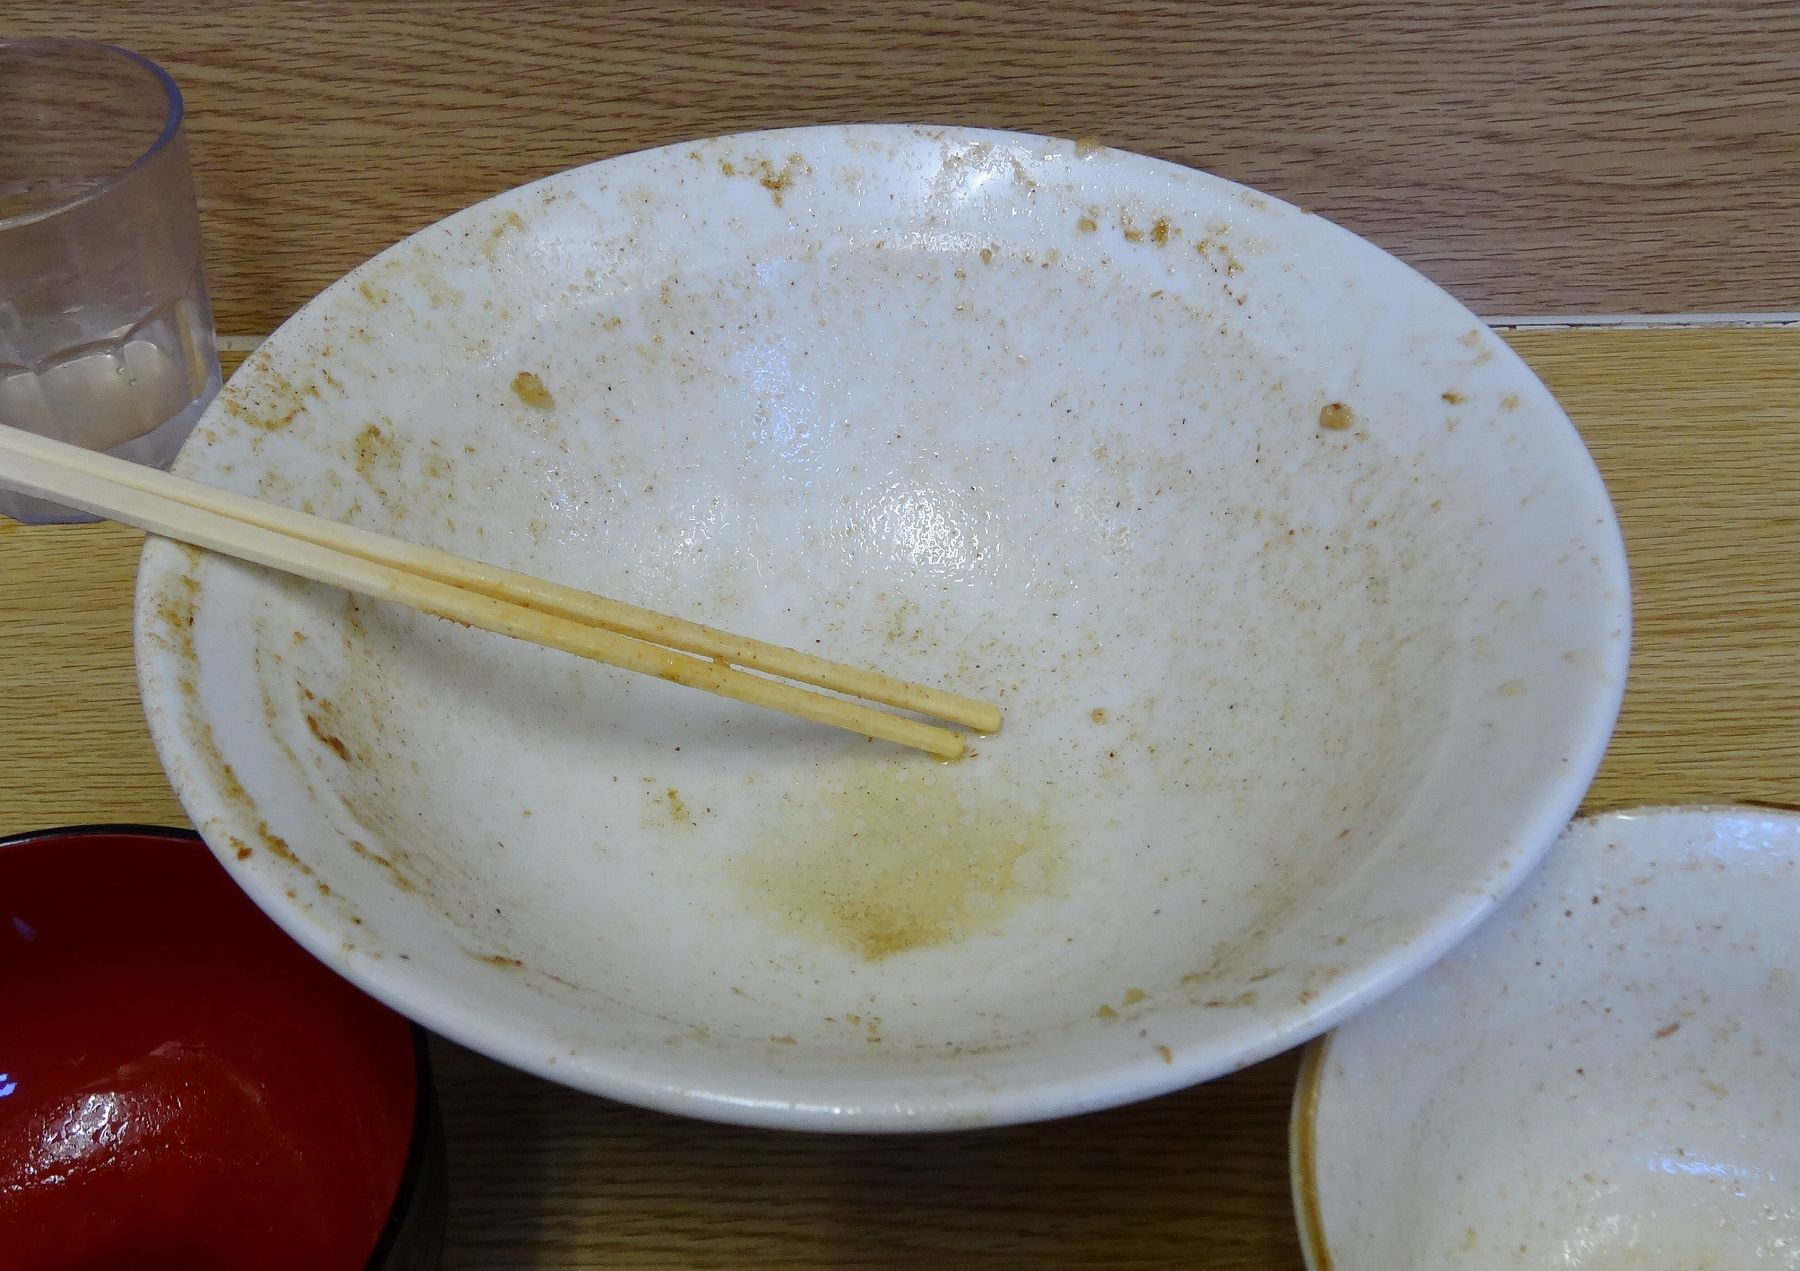 20121017009tochigi.jpg